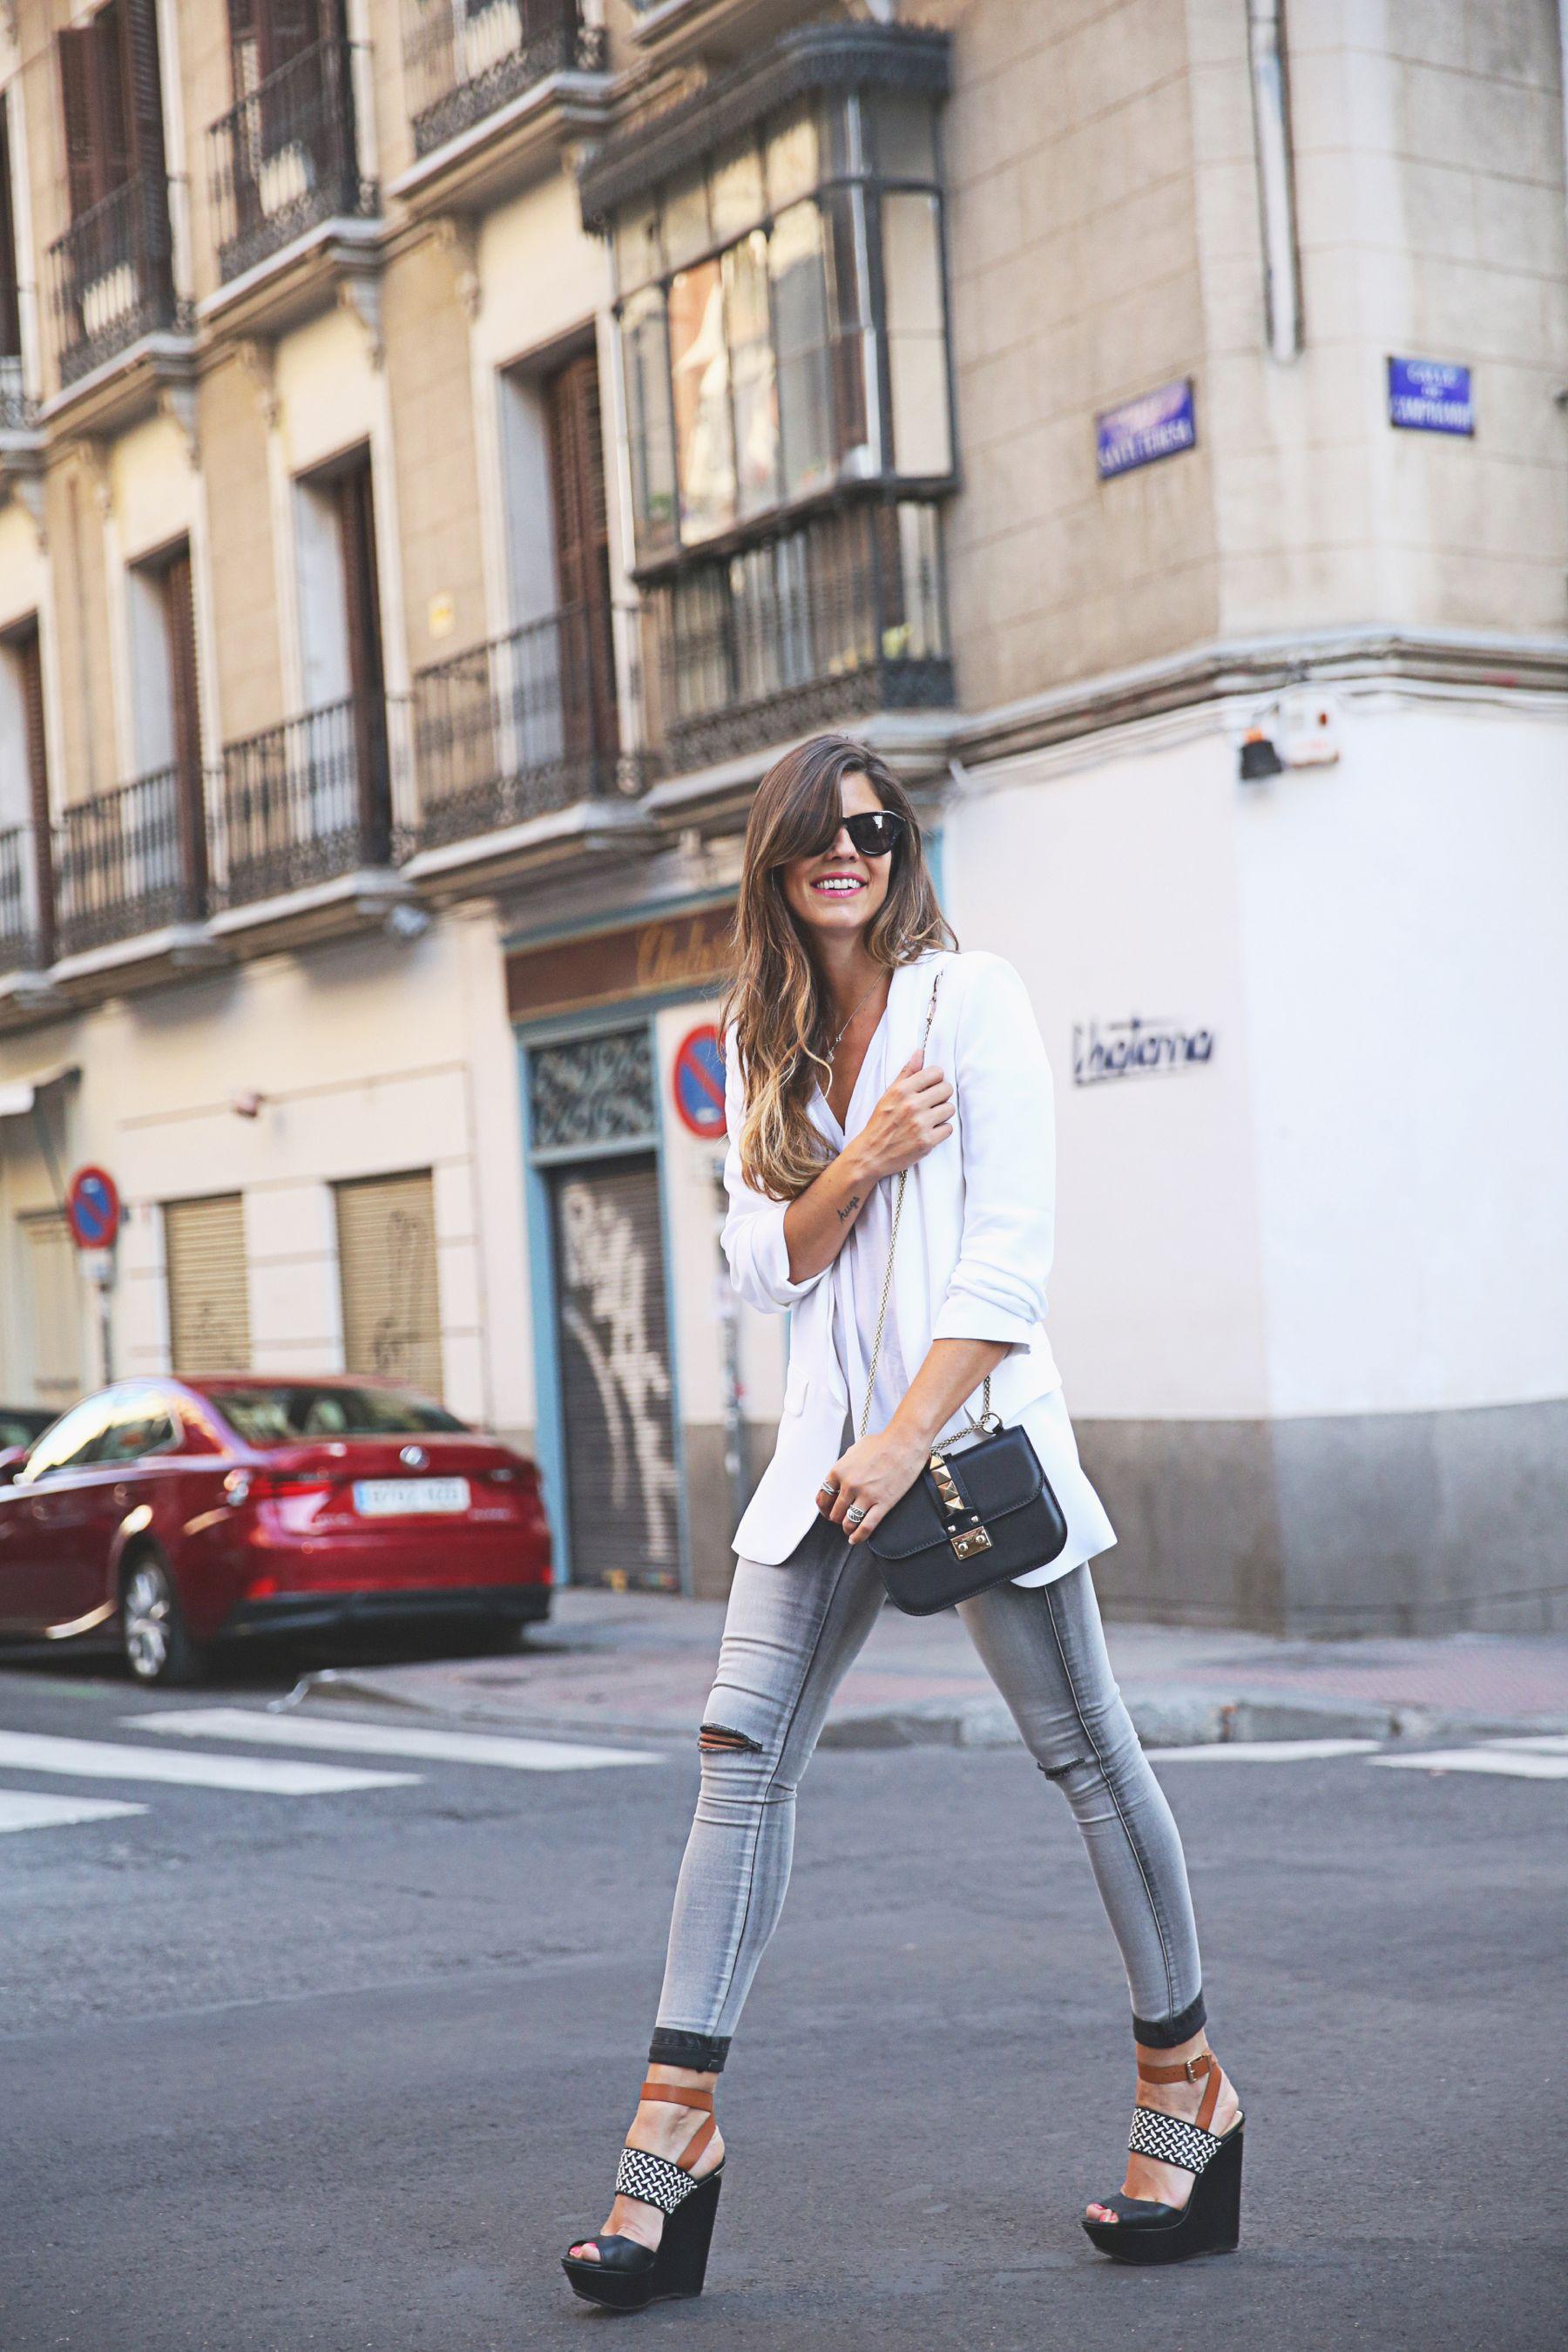 trendy-taste-look-outfit-street-style-ootd-blog-blogger-fashion-spain-moda-españa-SS15-verano2015-tendencias-trends-zara-buylevard-valentino-jessica-simpson-skinny-jeans-grey-white-blazer-americana-blanca-vaqueros-pitillo-sandalias-sandals-etnicas-2